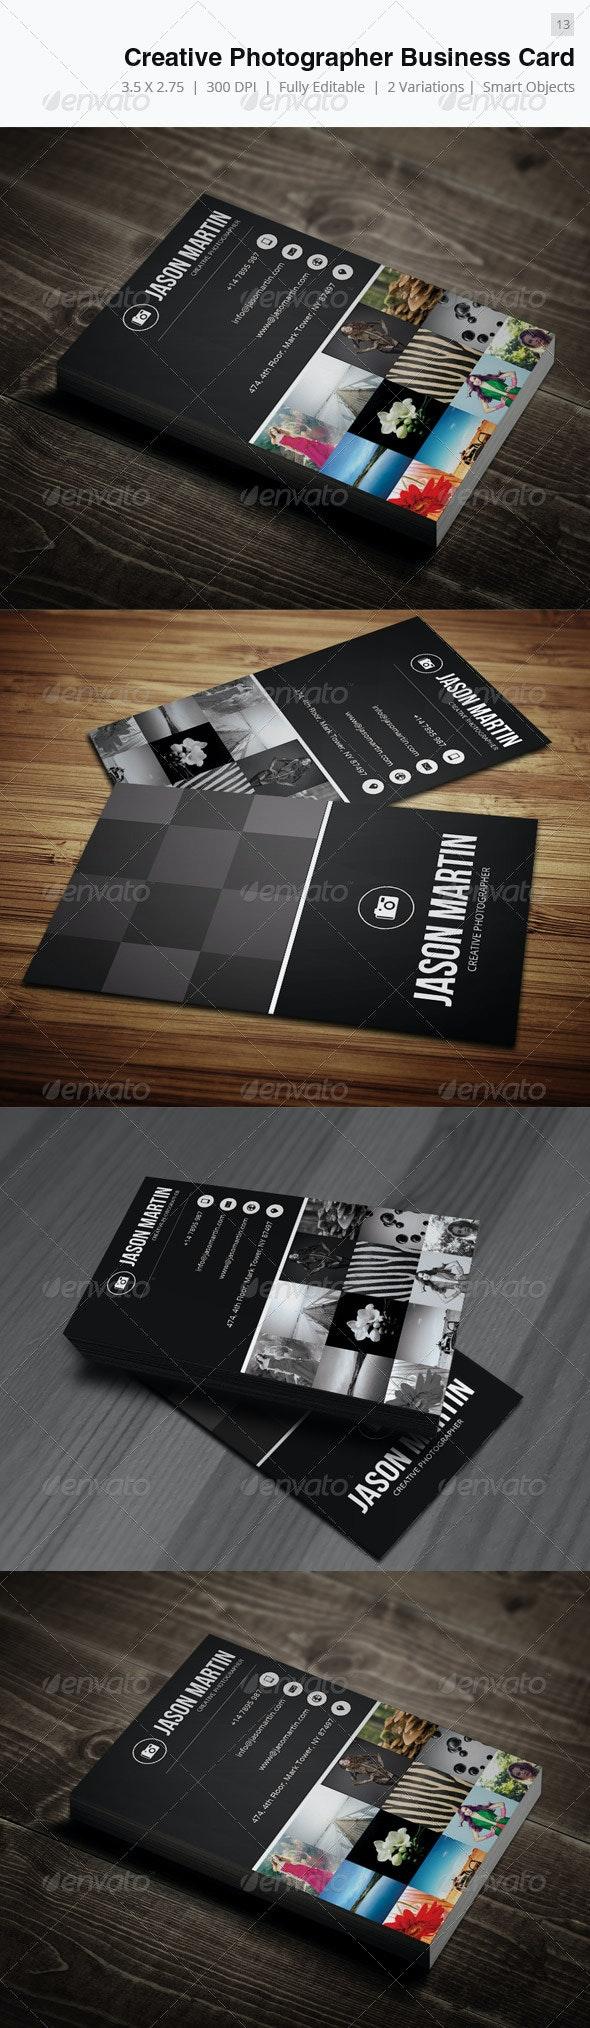 Creative Photographer Business Card - 13 - Creative Business Cards